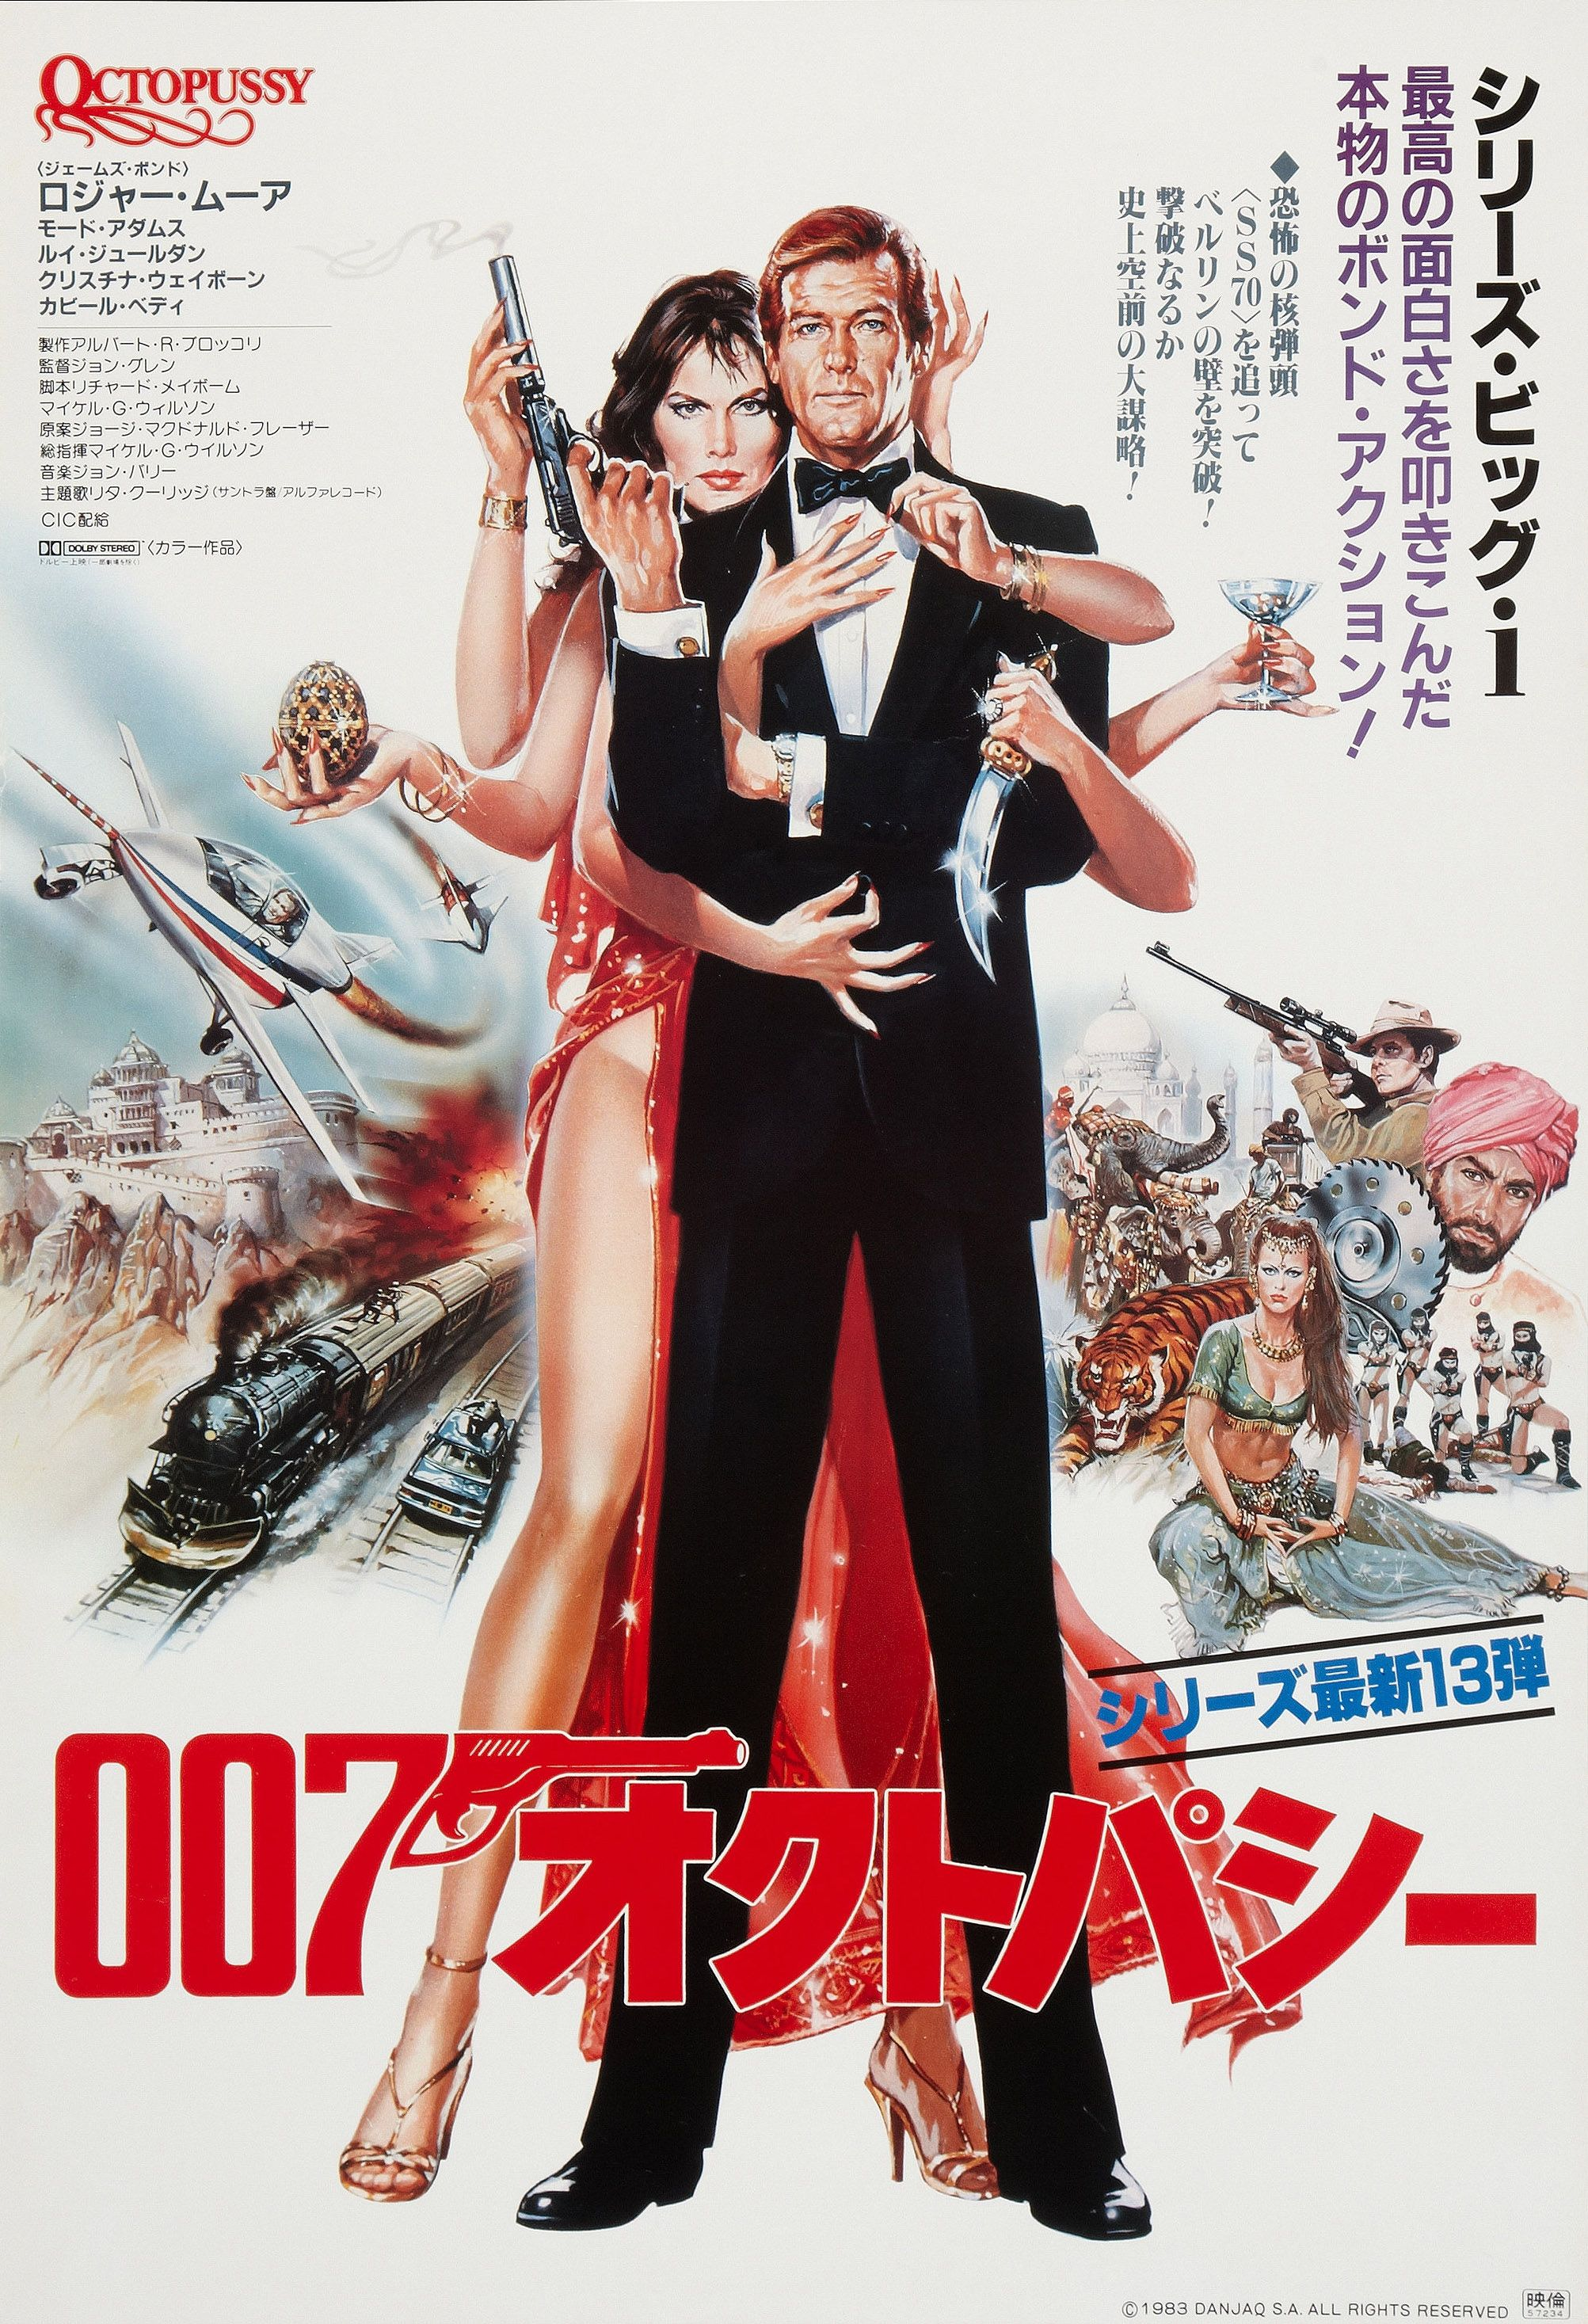 Octopussy (1983)   Japanese movie poster, James bond